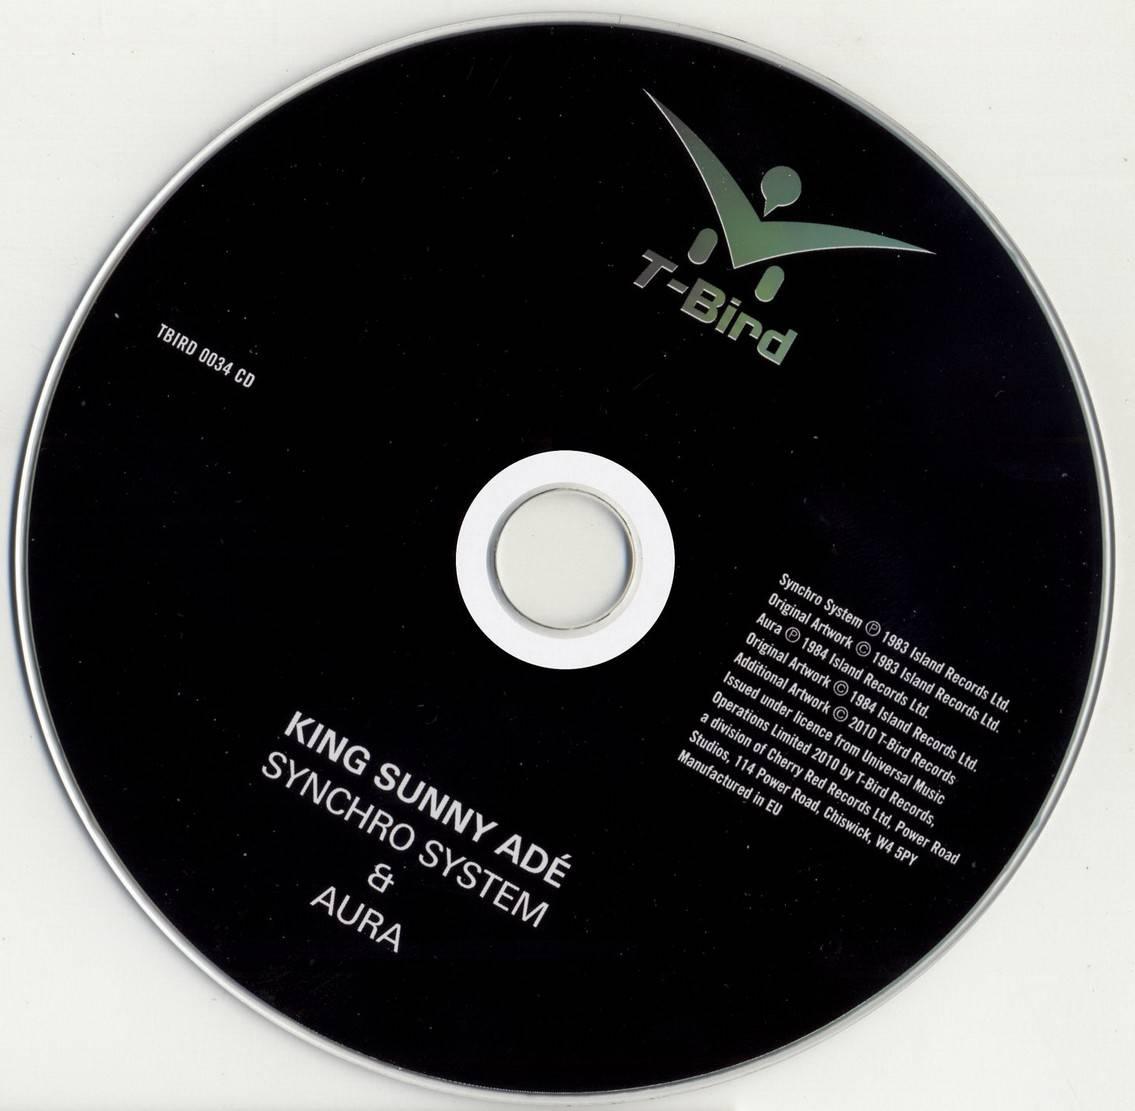 King Sunny Ade Synchro System Amp Aura 1983 84 T Bird